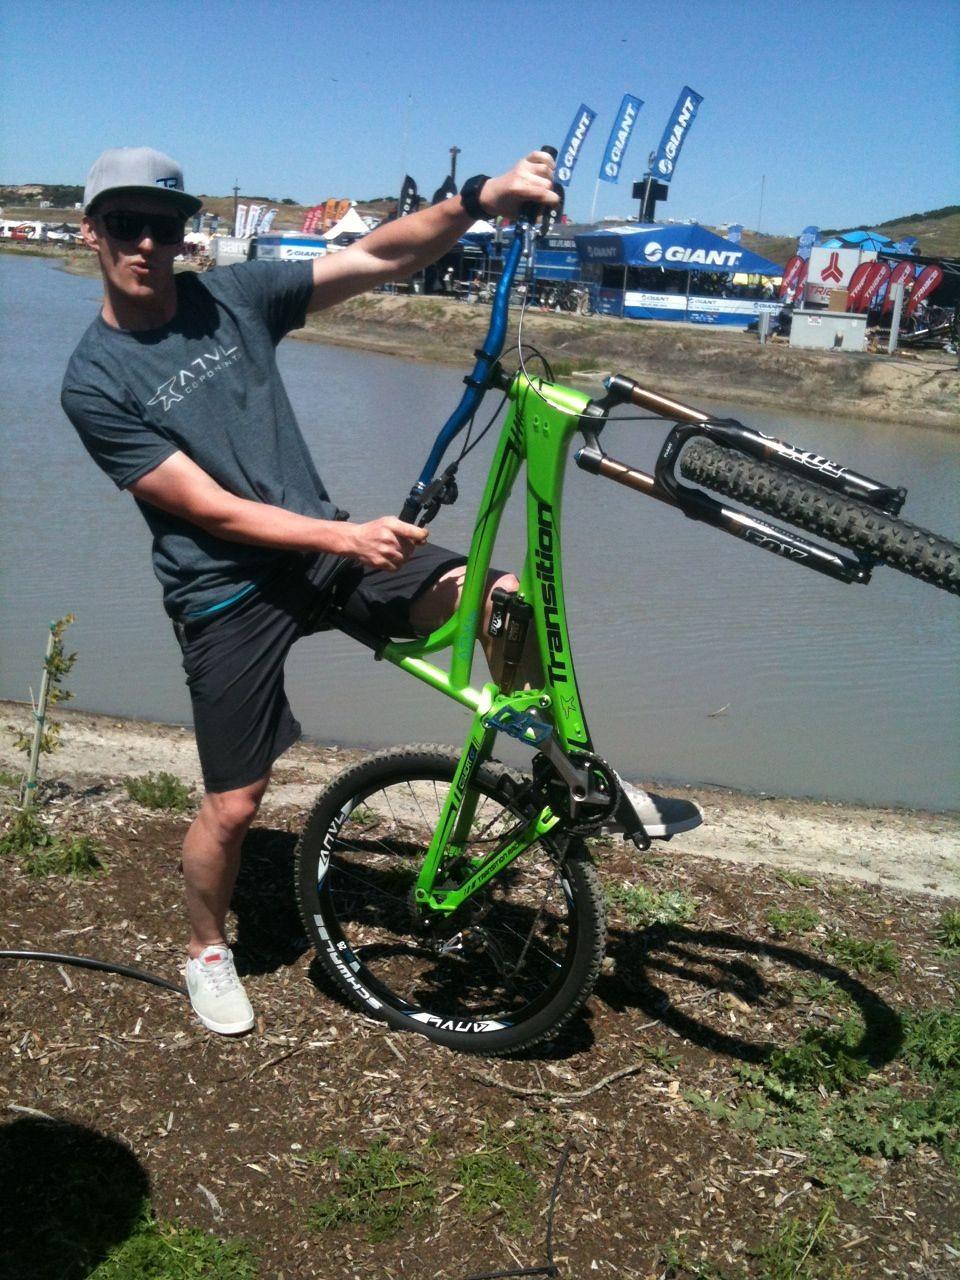 ANVL wheelie - iceman2058 - Mountain Biking Pictures - Vital MTB